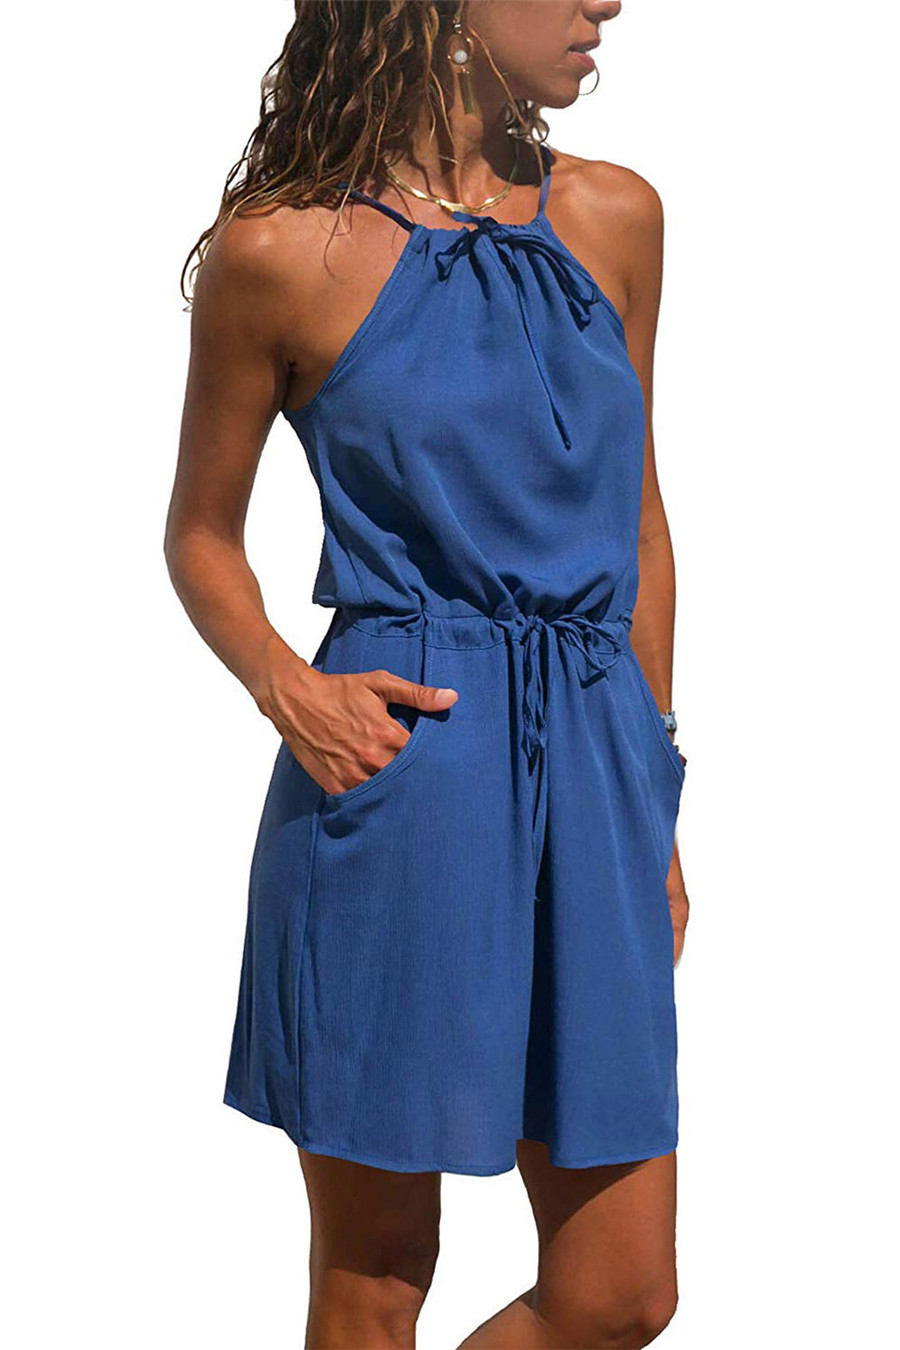 Gladiolus Chiffon Women Summer Dress Spaghetti Strap Floral Print Pocket Sexy Bohemian Beach Dress 2019 Short Ladies Dresses (45)